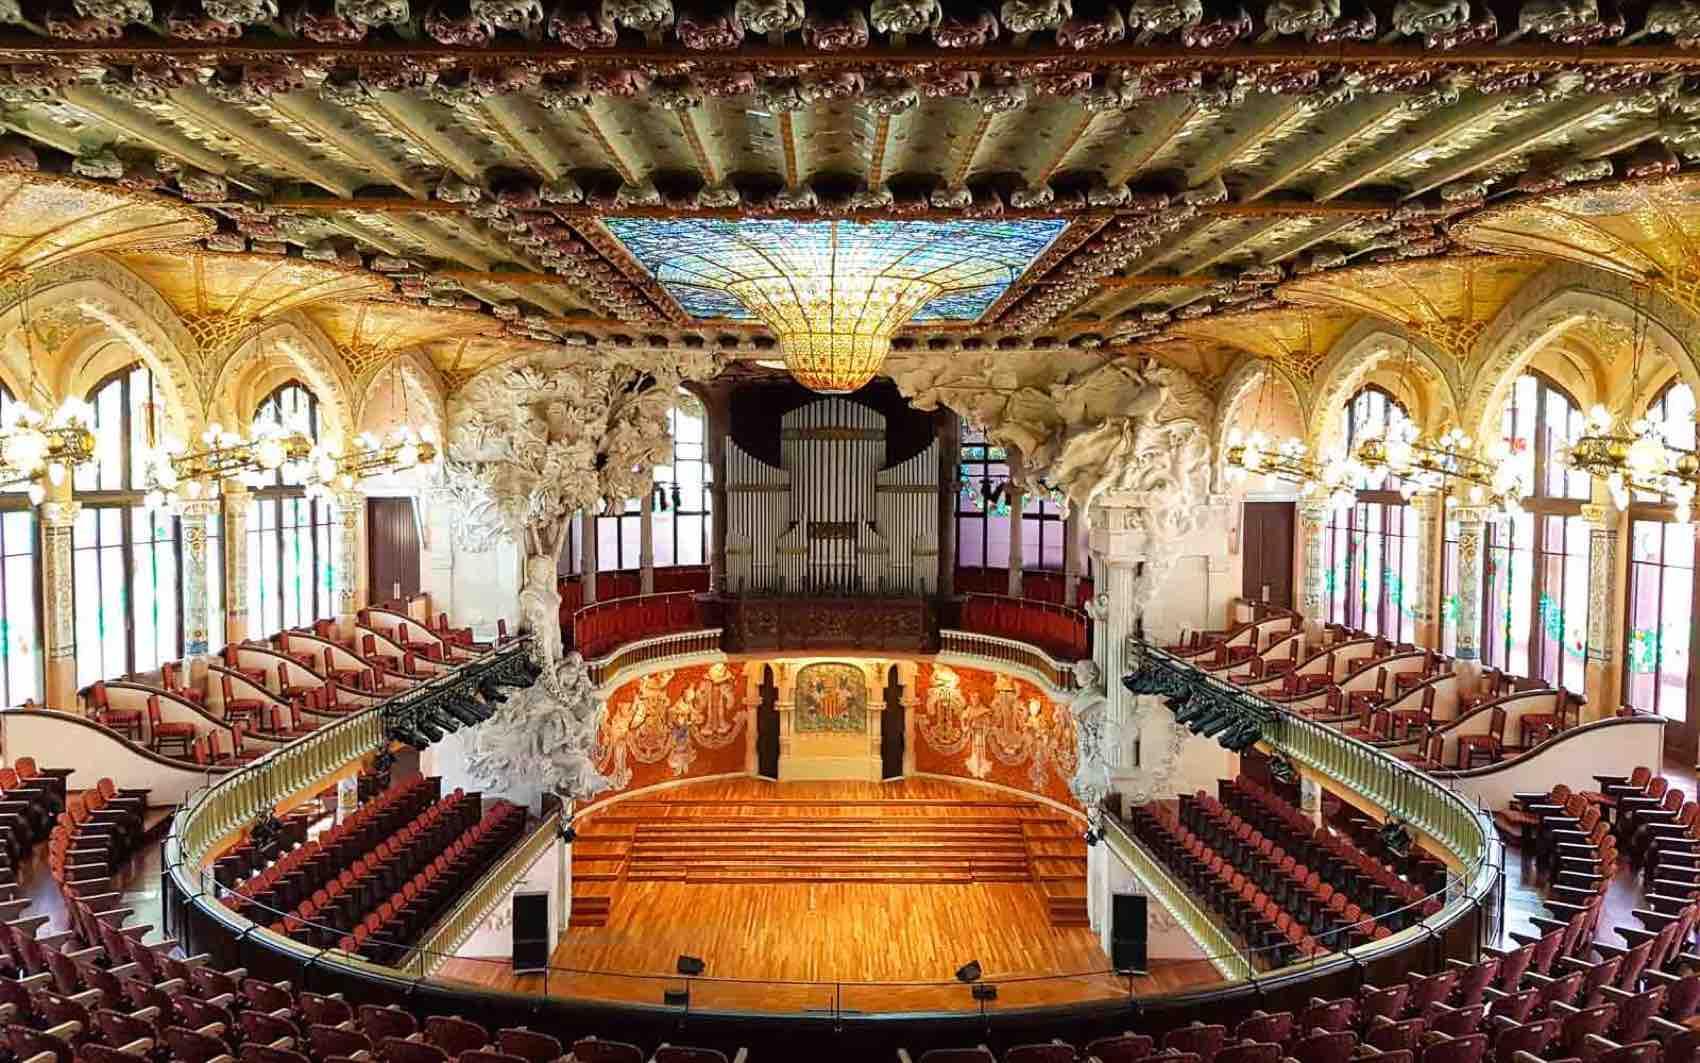 Palau Music Hall in Barcelona